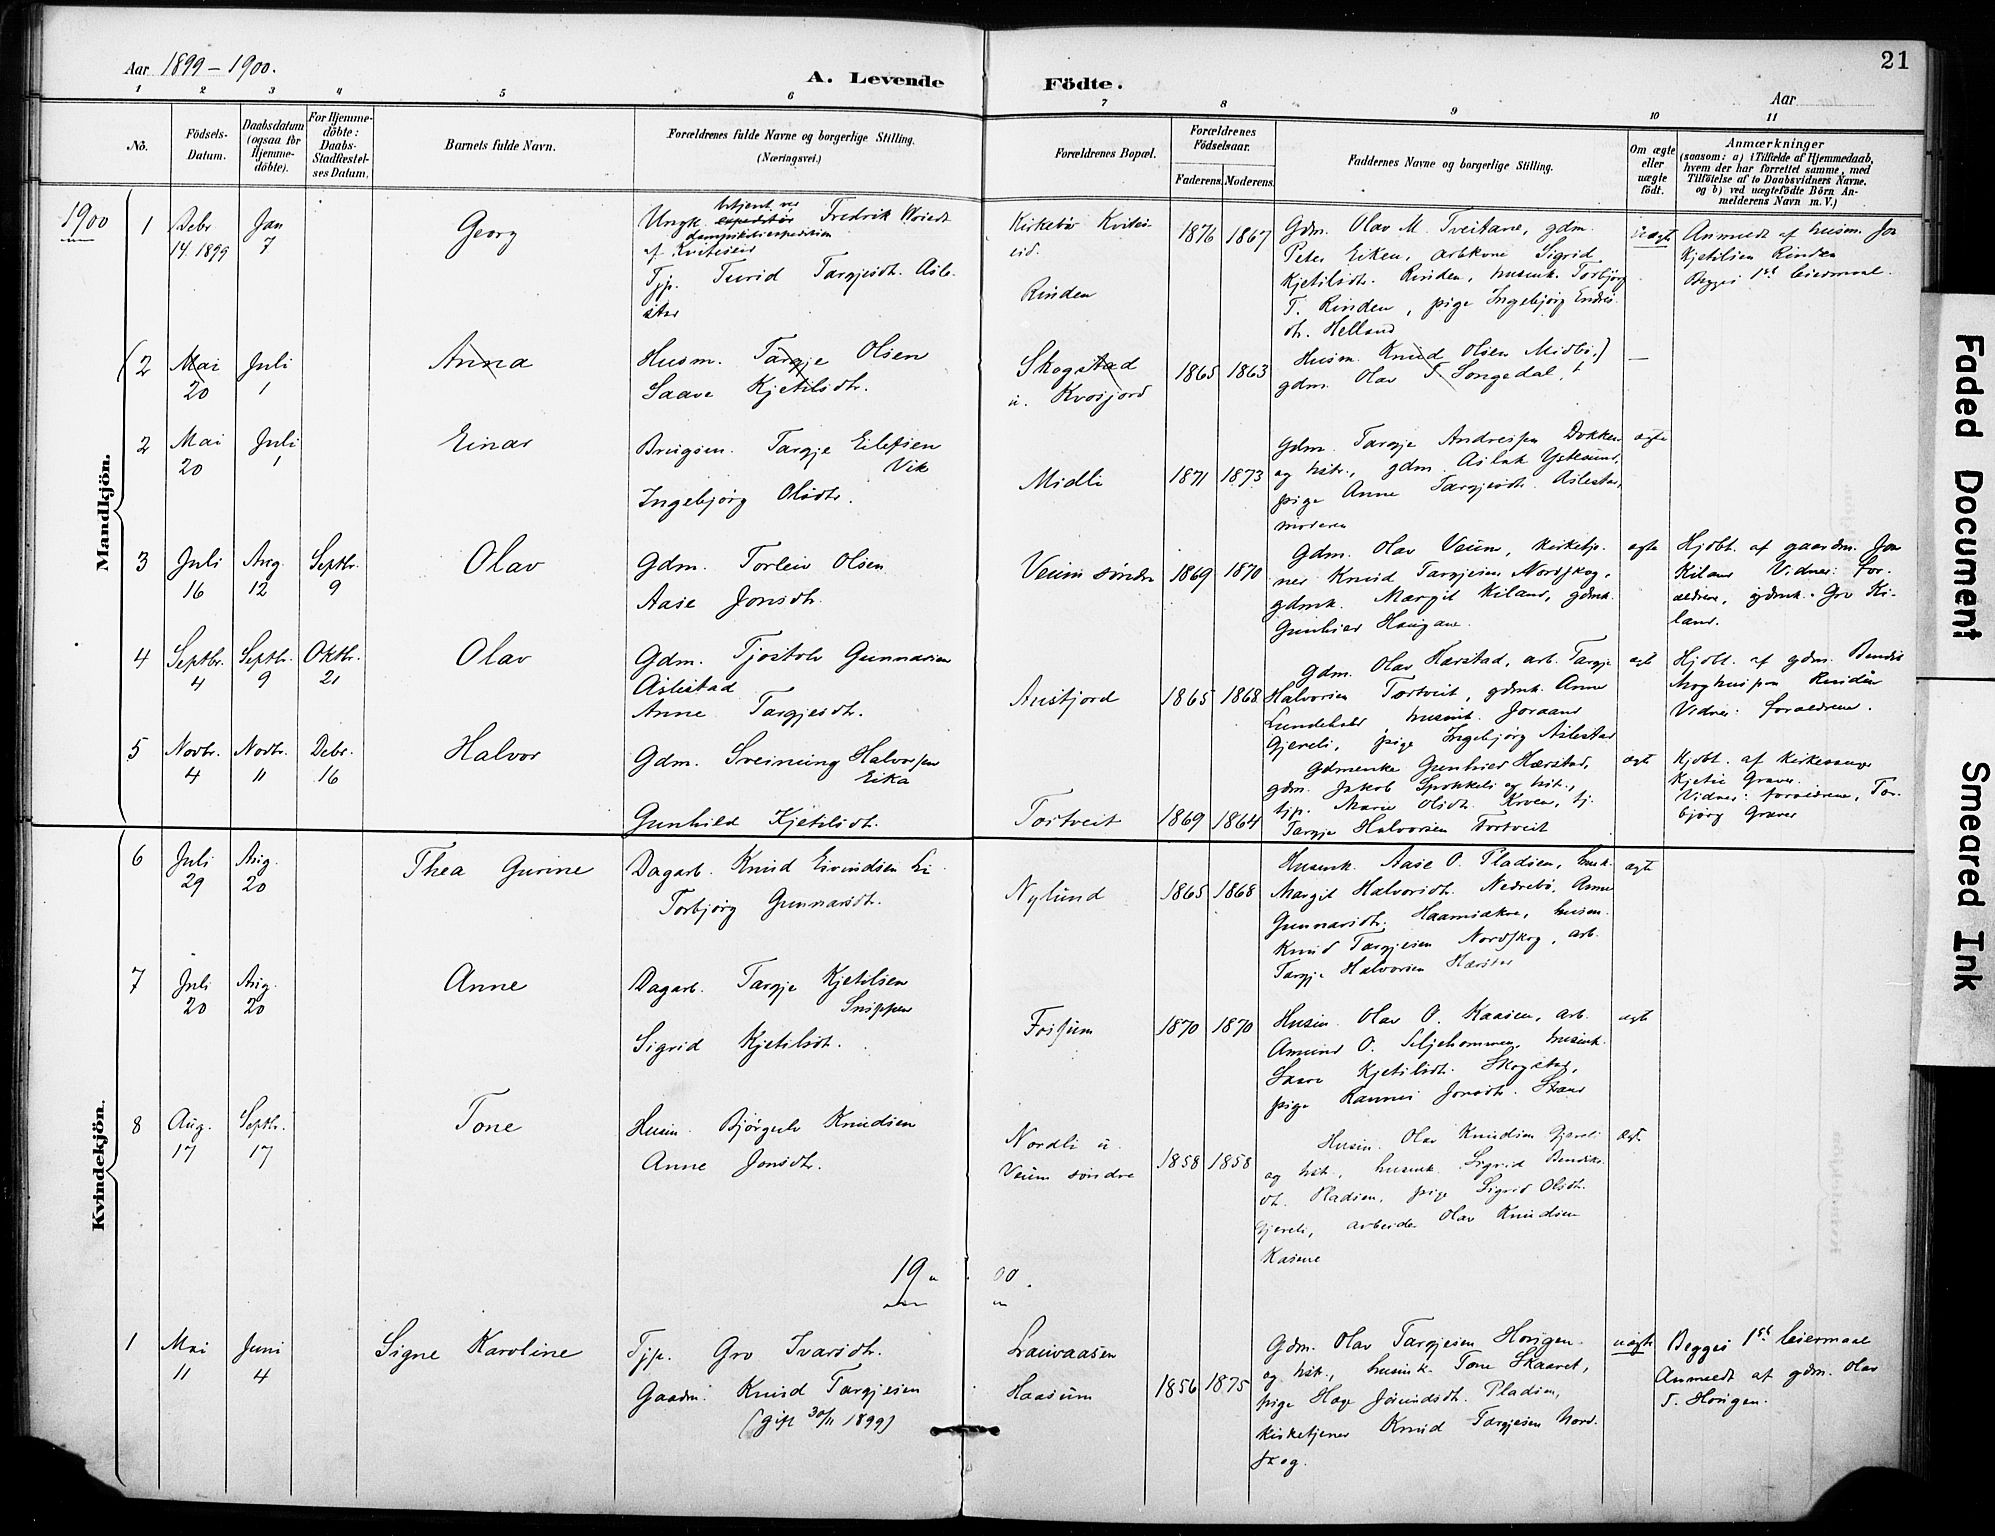 SAKO, Fyresdal kirkebøker, F/Fb/L0003: Ministerialbok nr. II 3, 1887-1903, s. 21